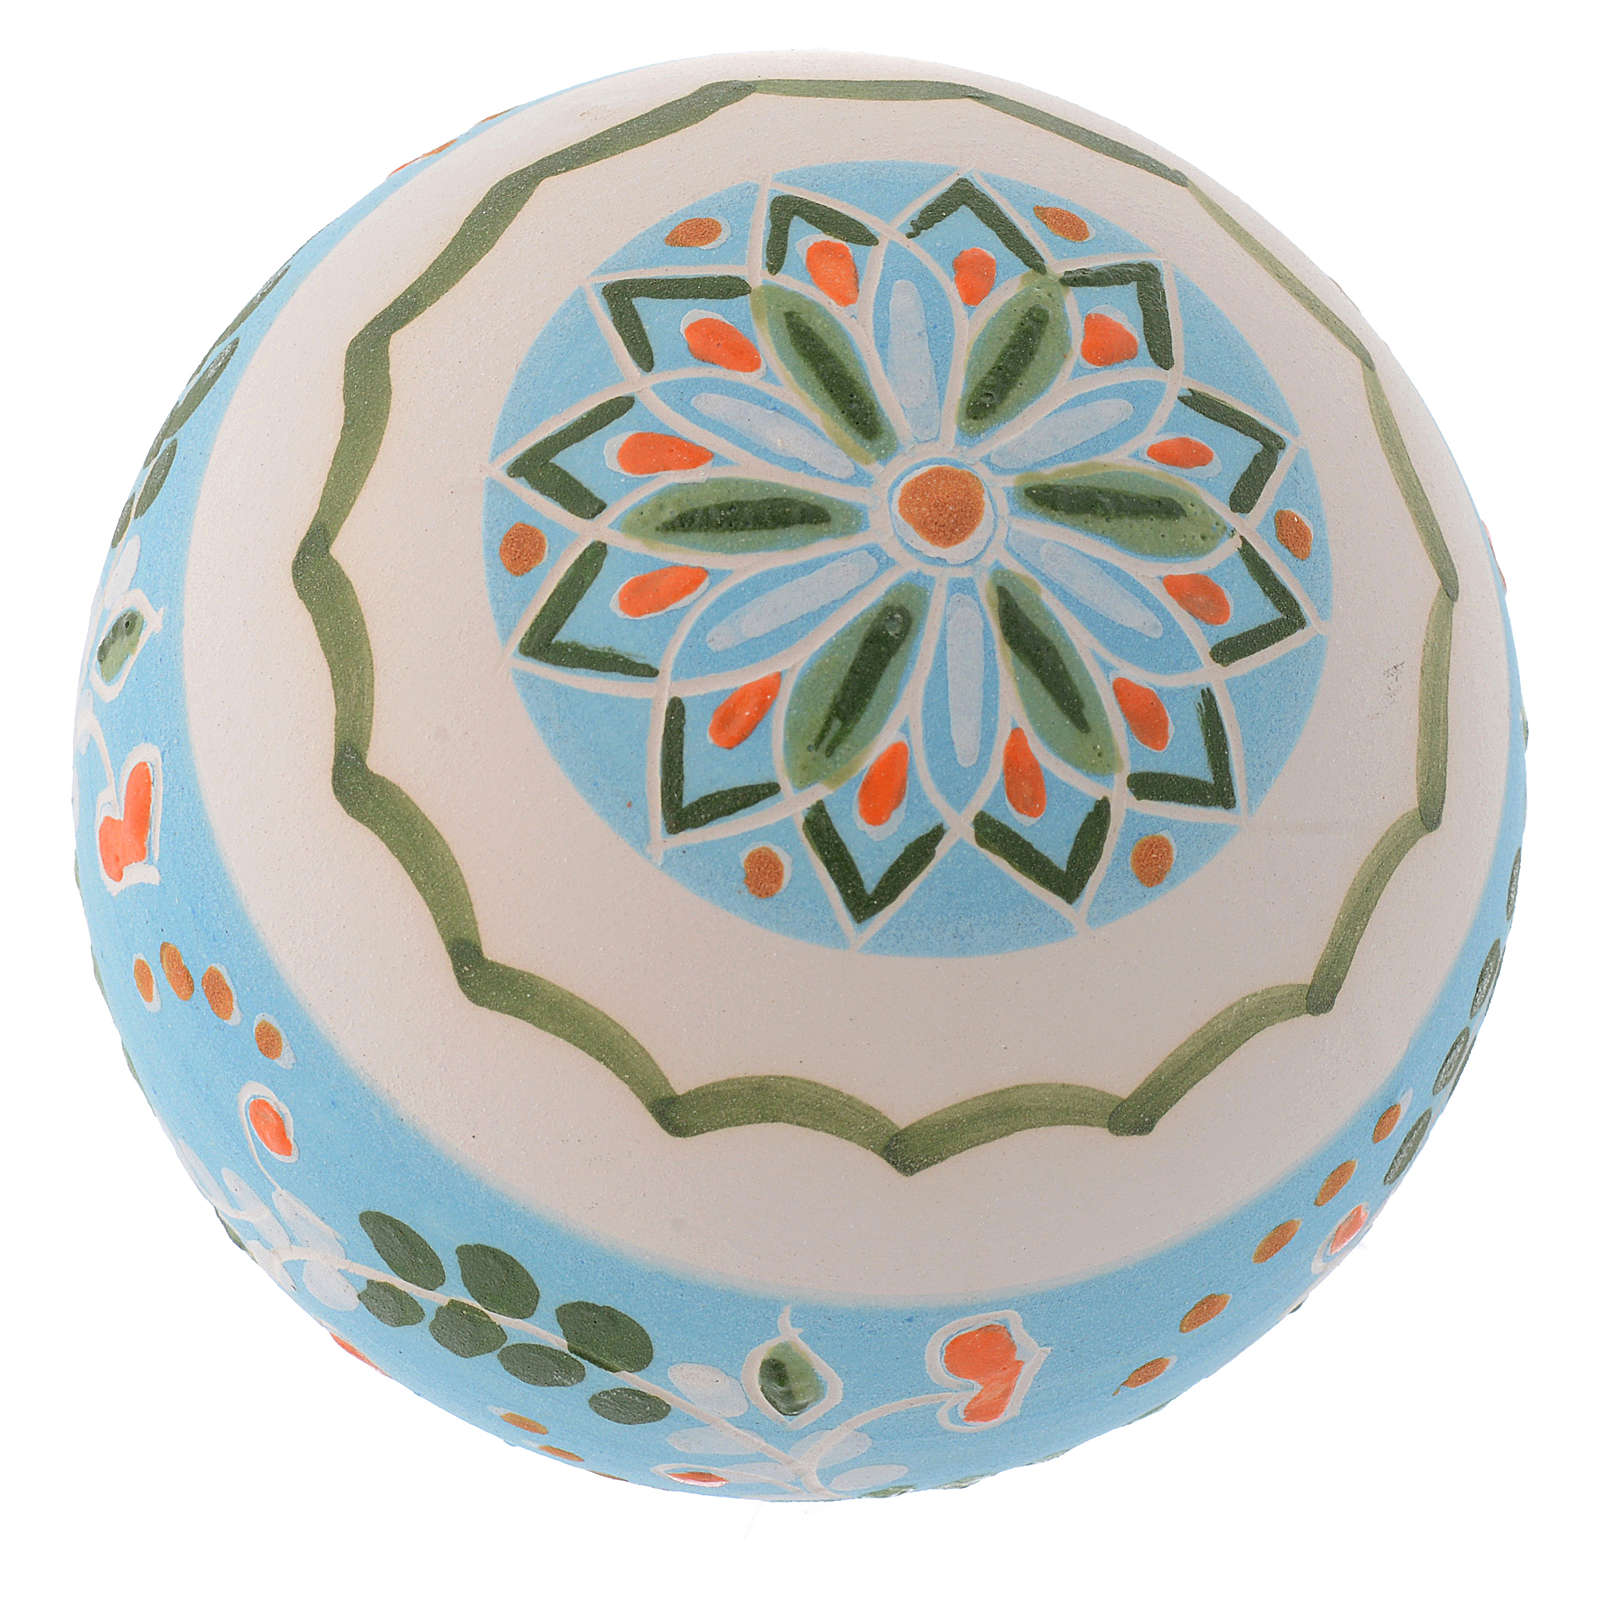 Boule blanche ronde pour sapin terre cuite Deruta 80 mm 4